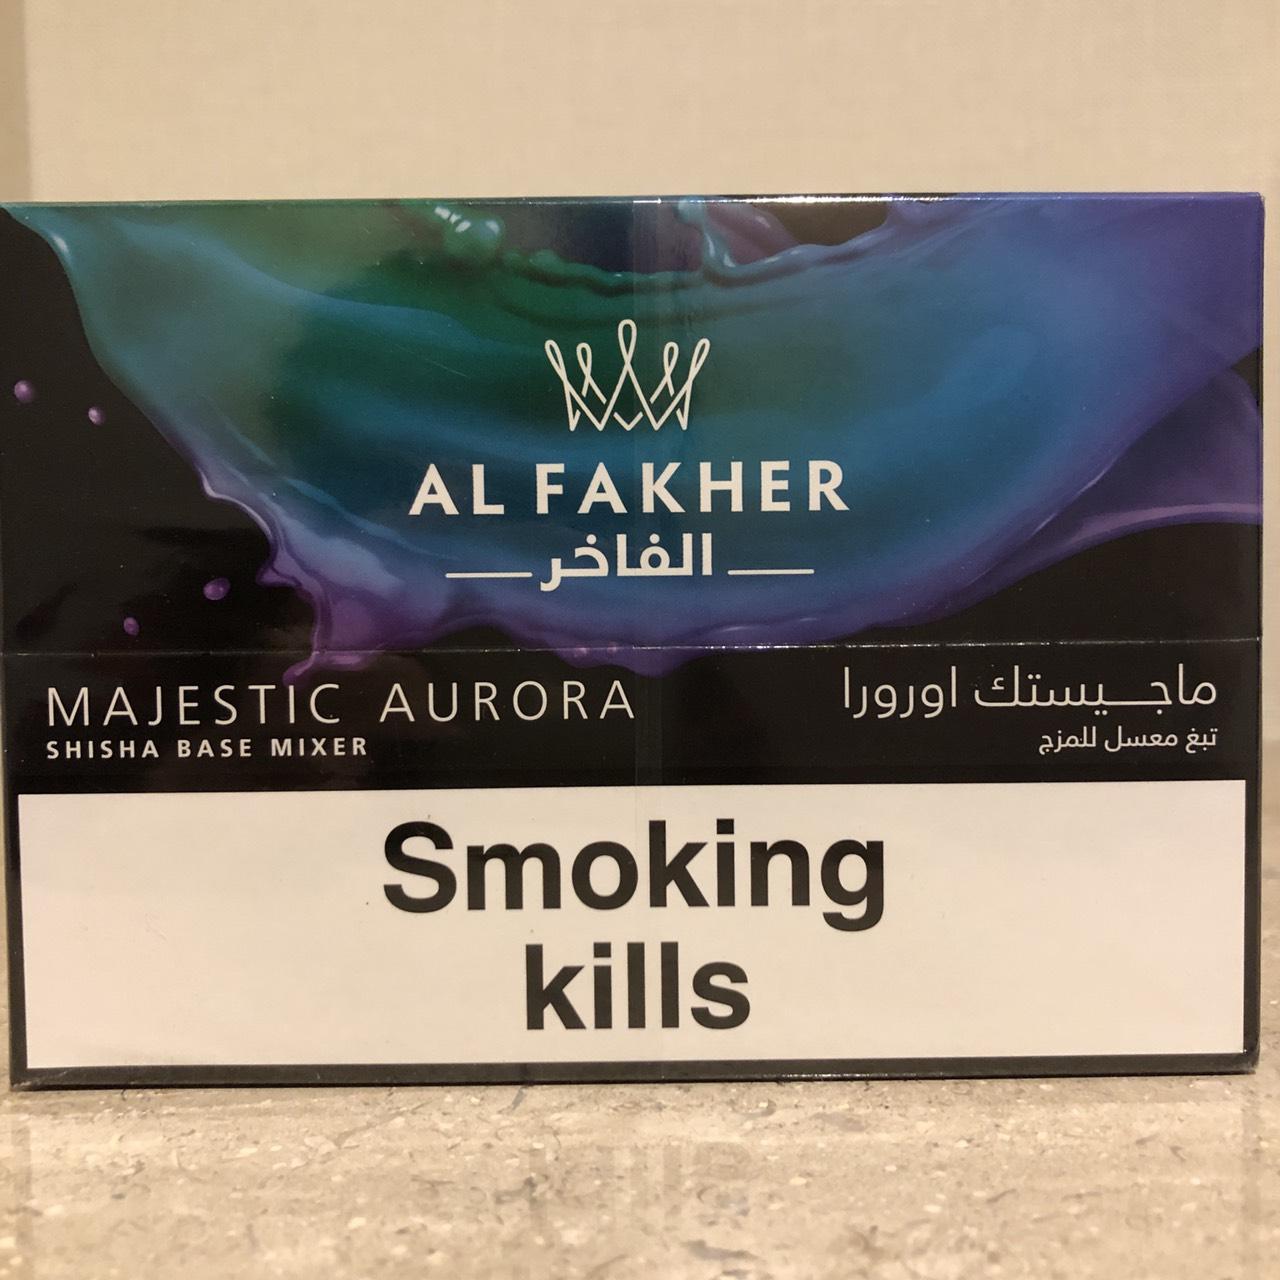 Al Fakher Base Mixer / Majestic Aurora(Grapefruit系の香りと香草系あるいは針葉樹の樹脂のような香り、非常に爽やか)